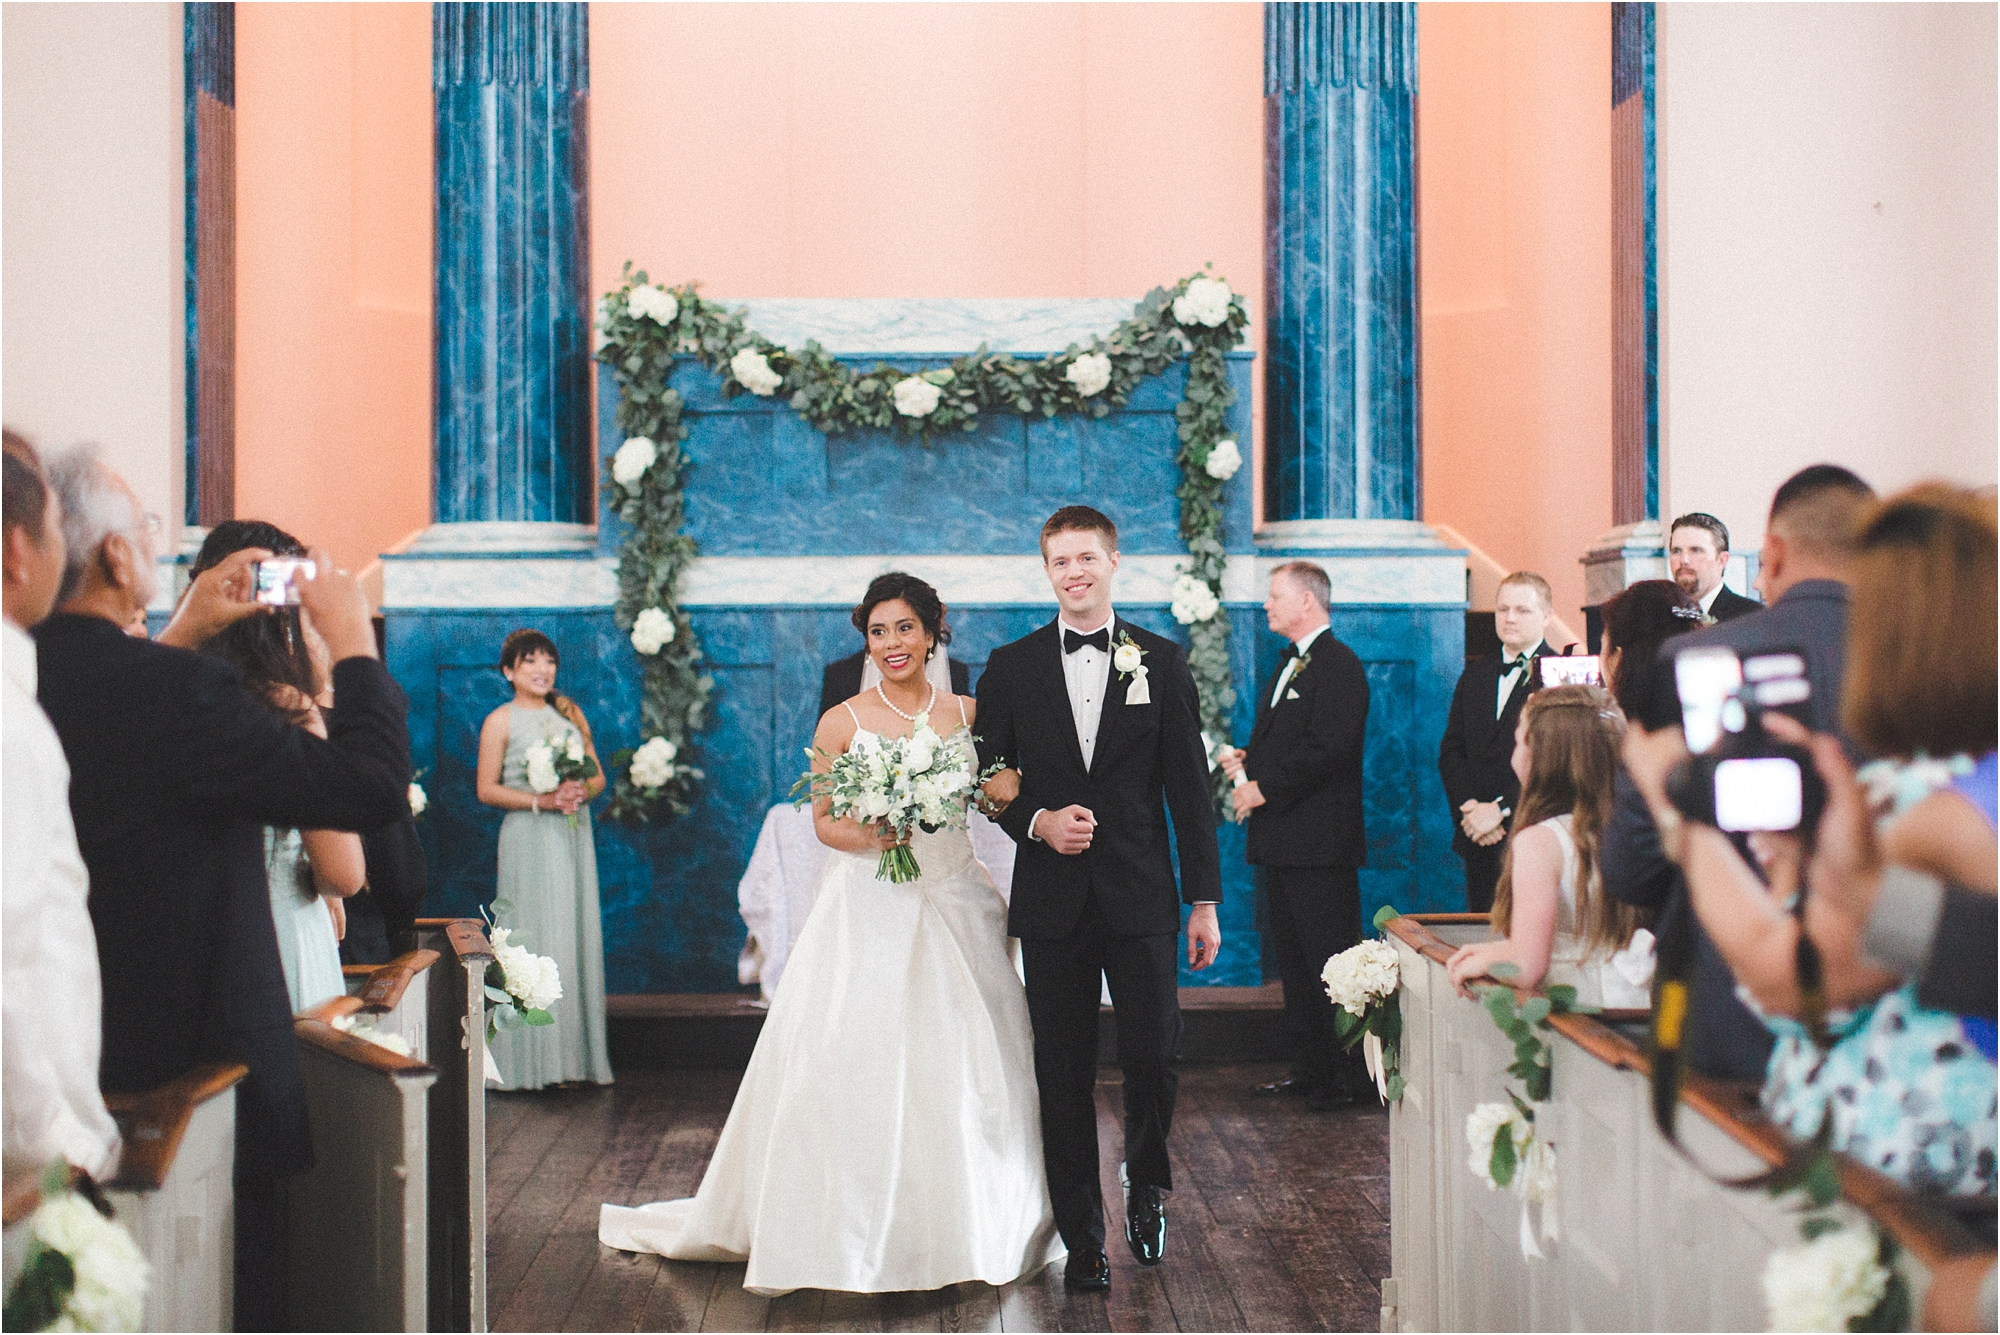 stephanie-yonce-photography-historic-church-virginia-museu-fine-arts-wedding-photos_046.JPG